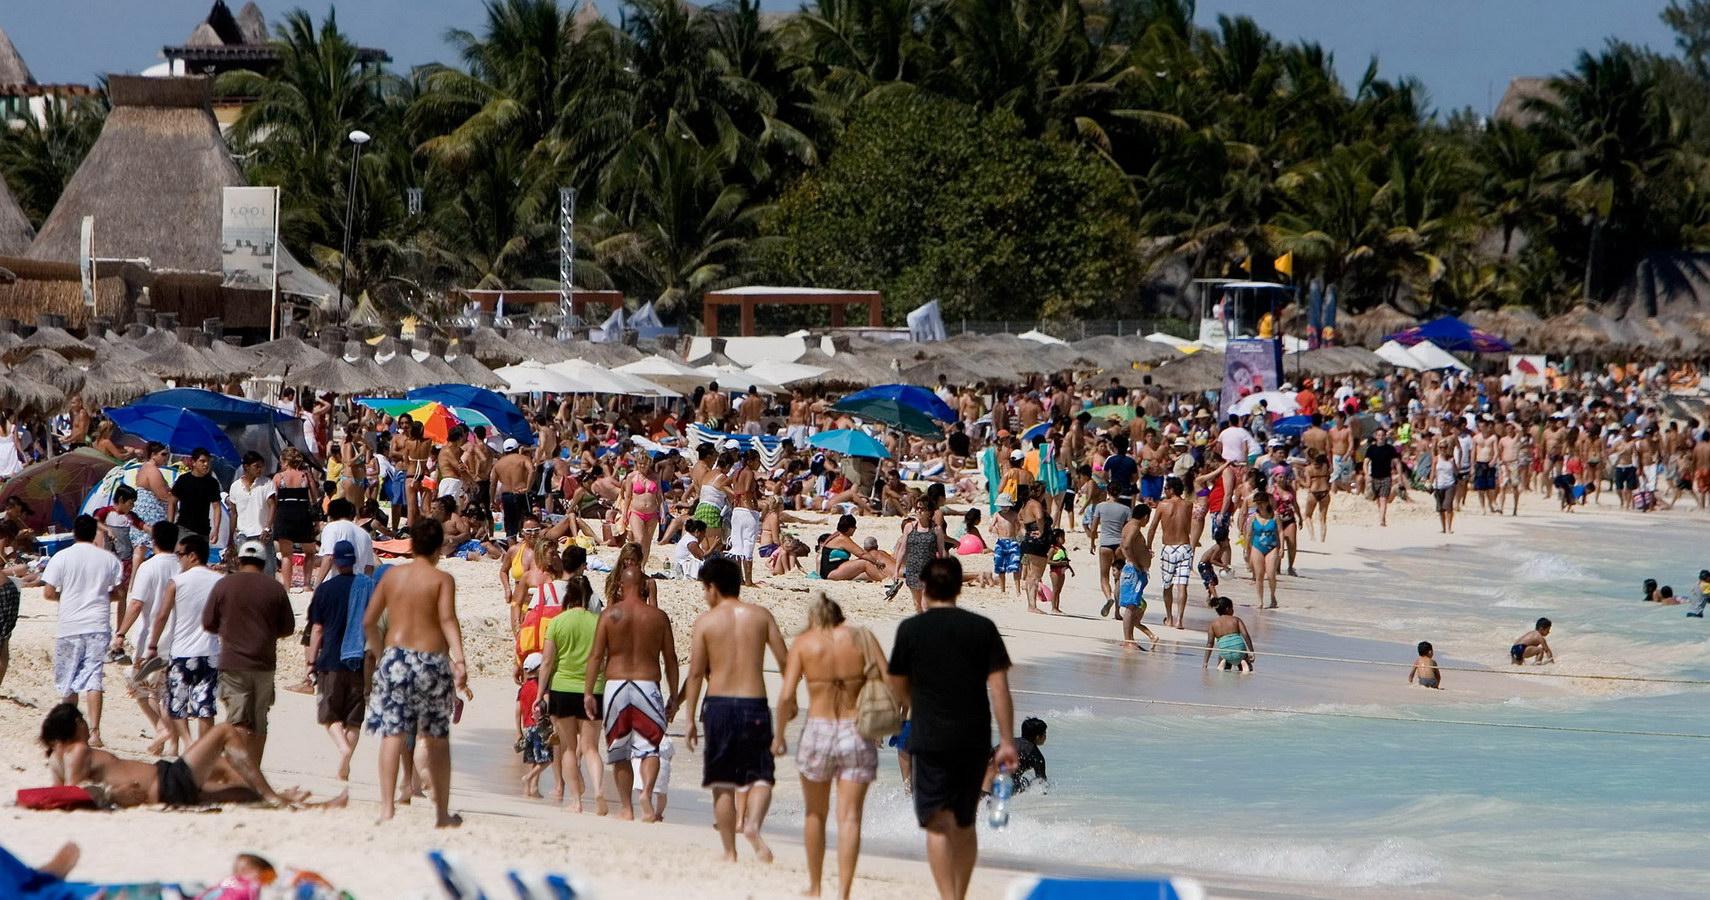 Turistas en Playa Mamitas - Playa del Carmen